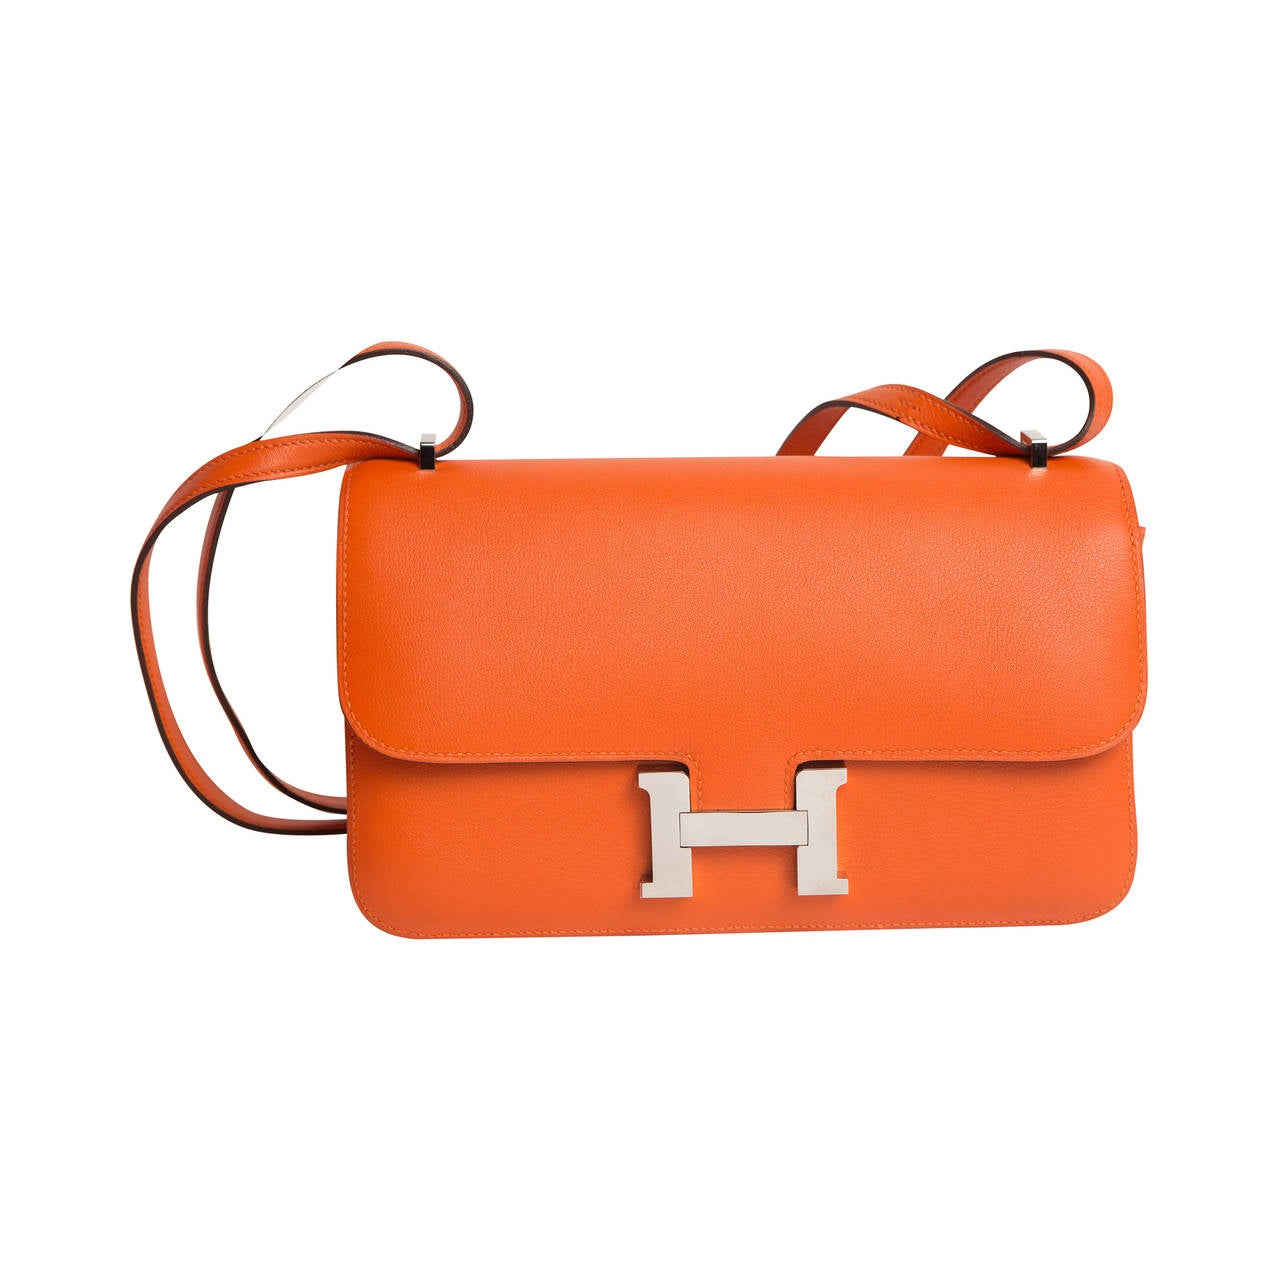 Hermes Orange Leather Contance Handbag with H Logo at 1stdibs